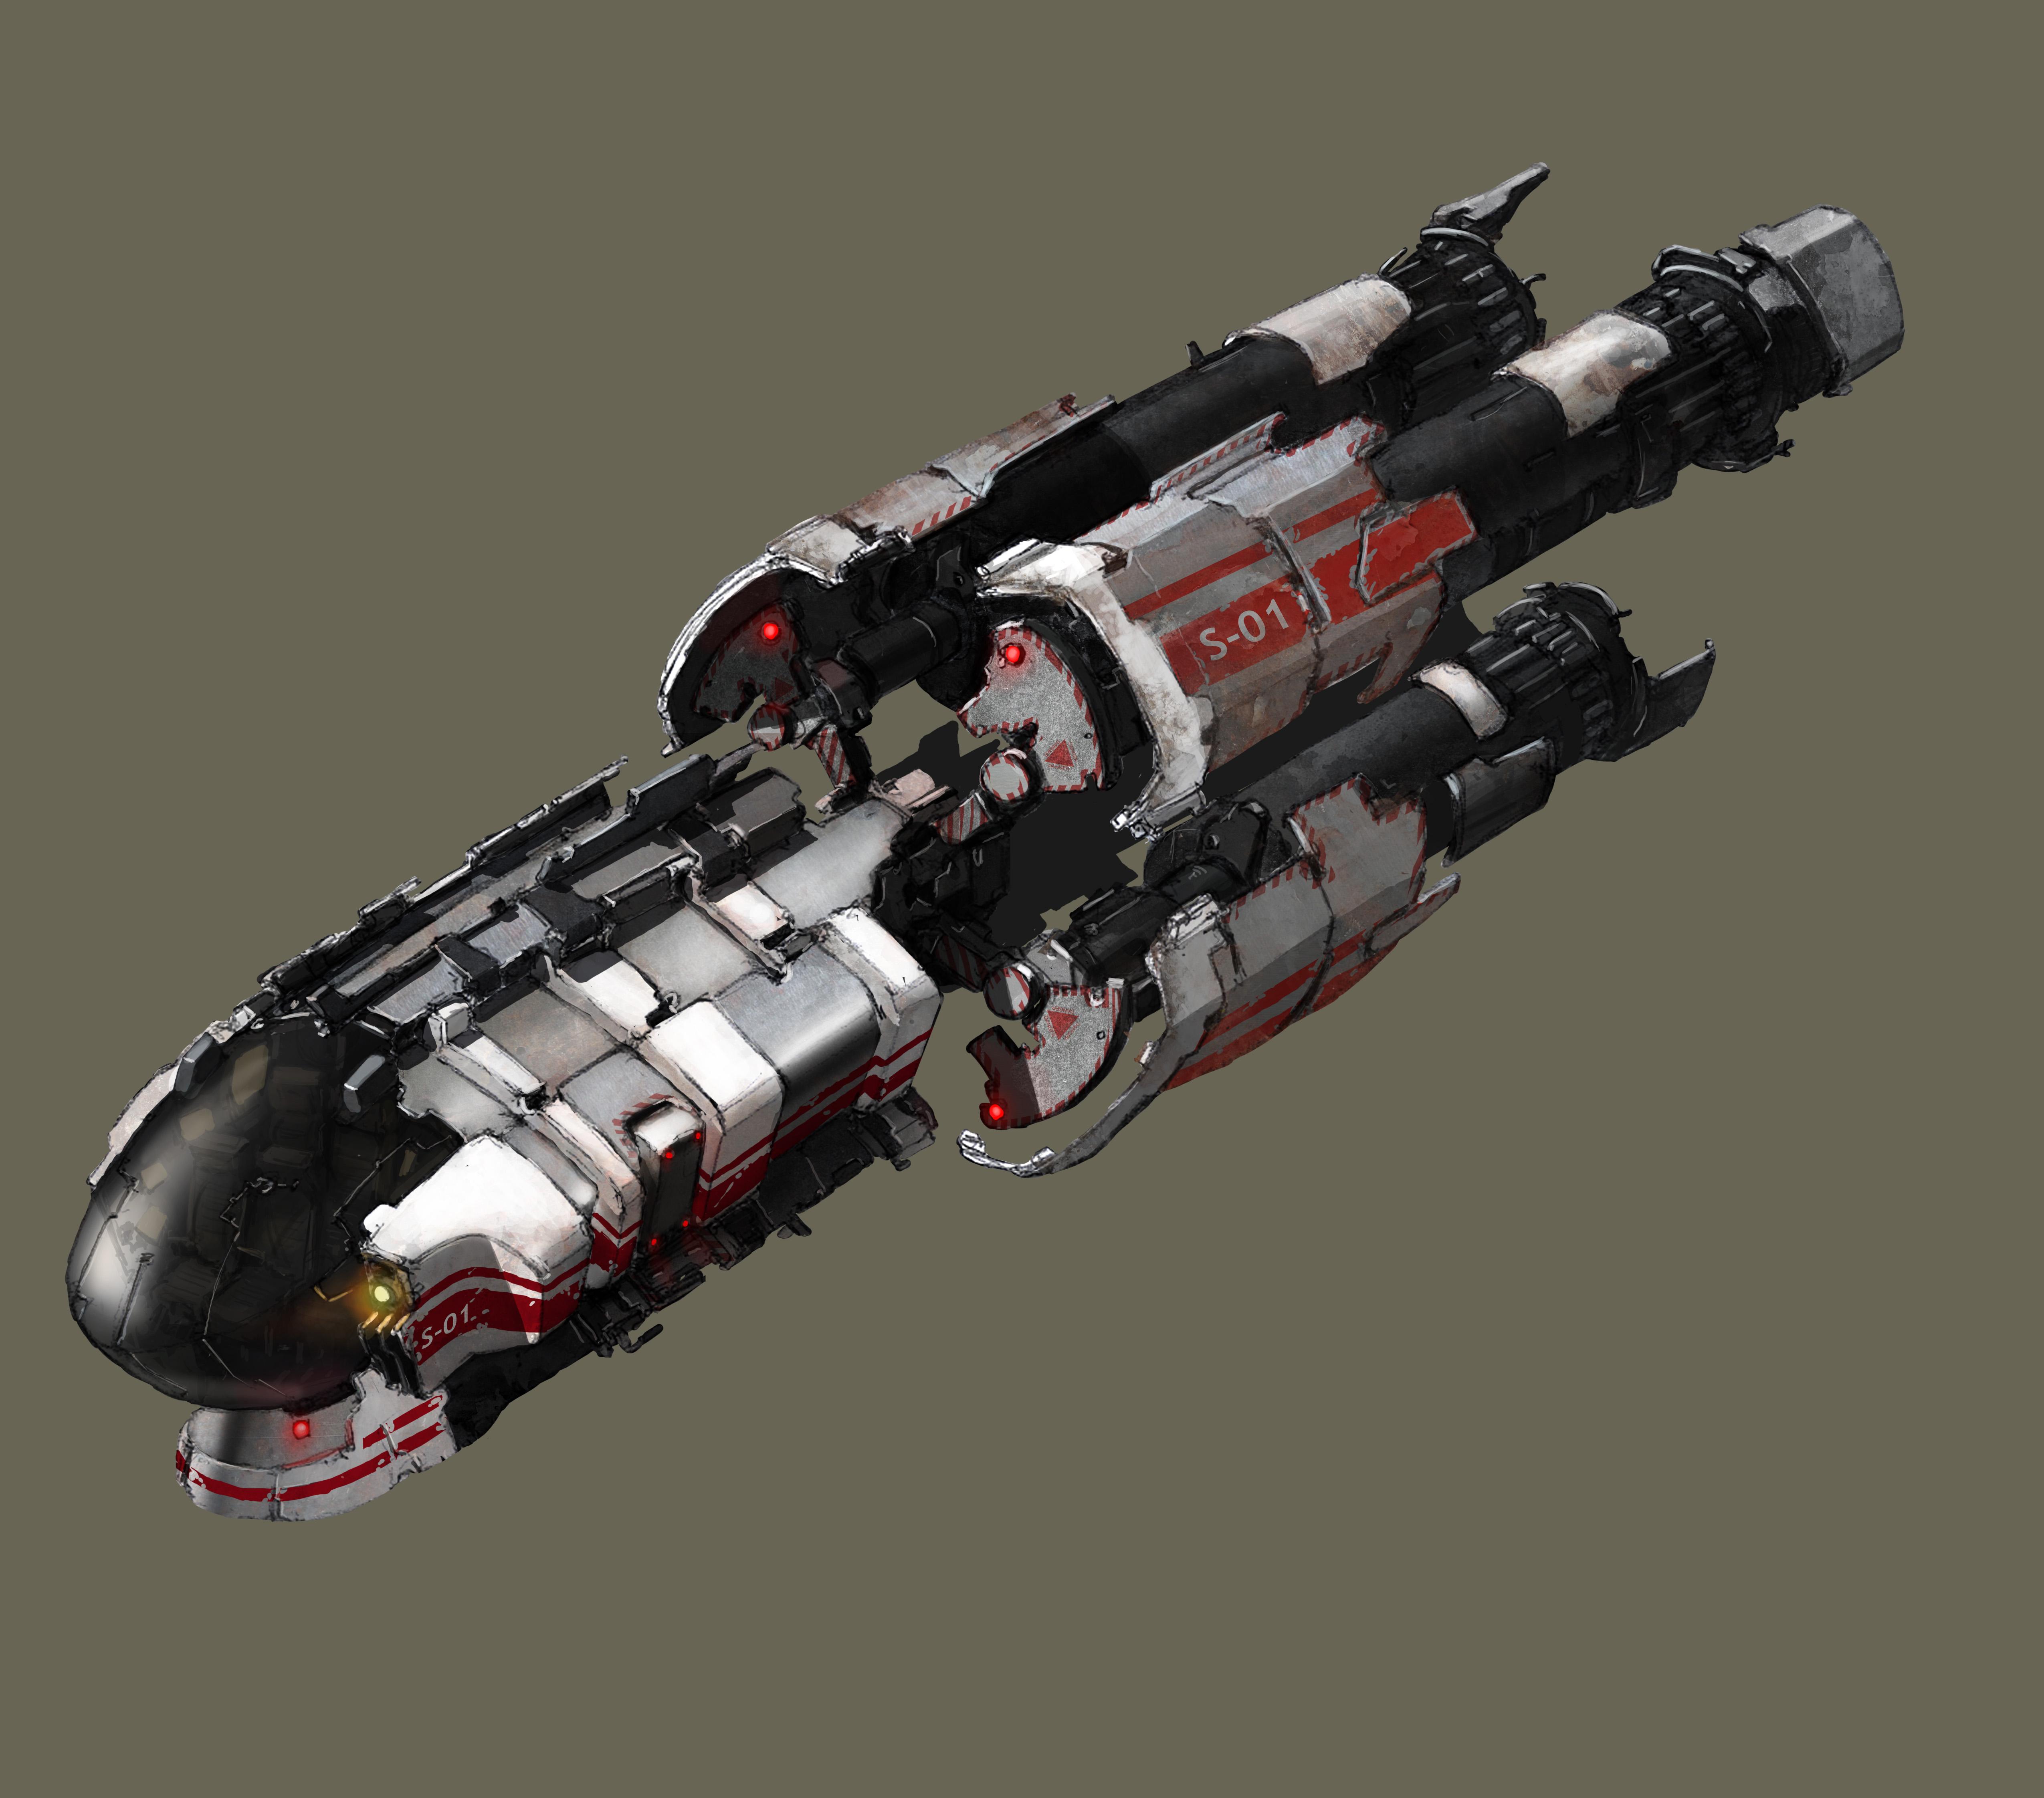 File:Shuttle editV2.jpg